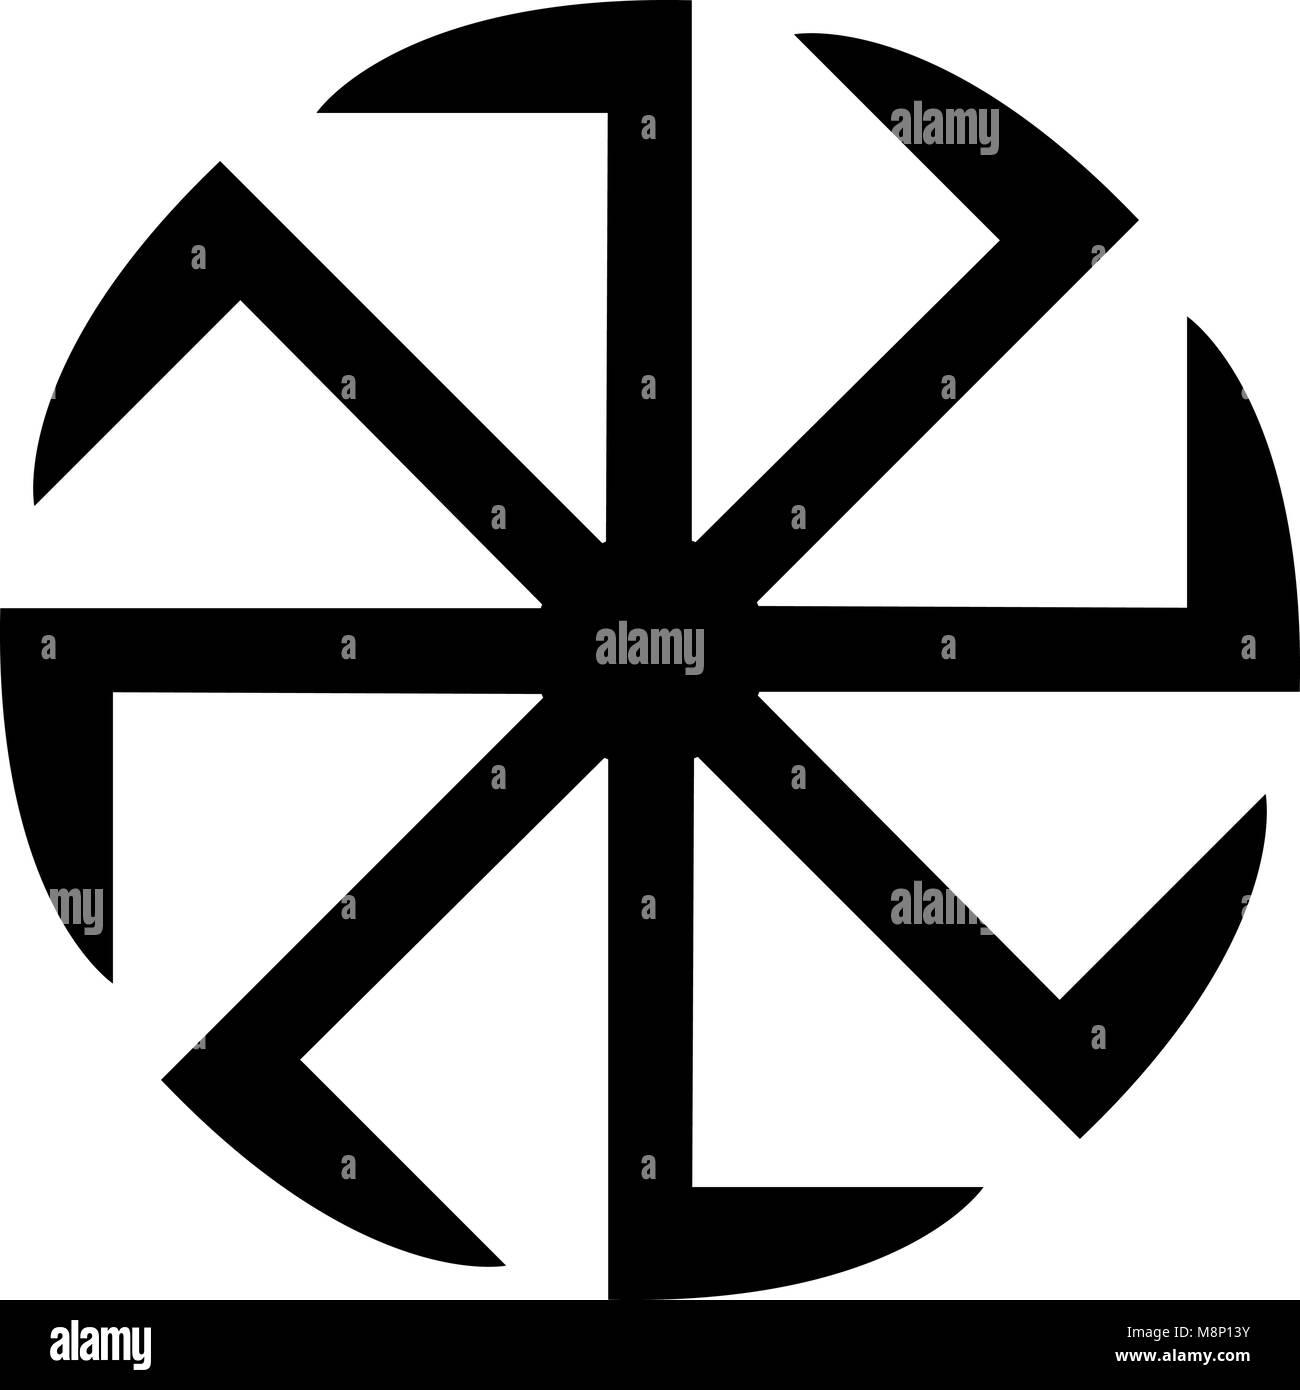 Slavic slavonis symbol Kolovrat sign sun icon black color vector illustration flat style simple image - Stock Image